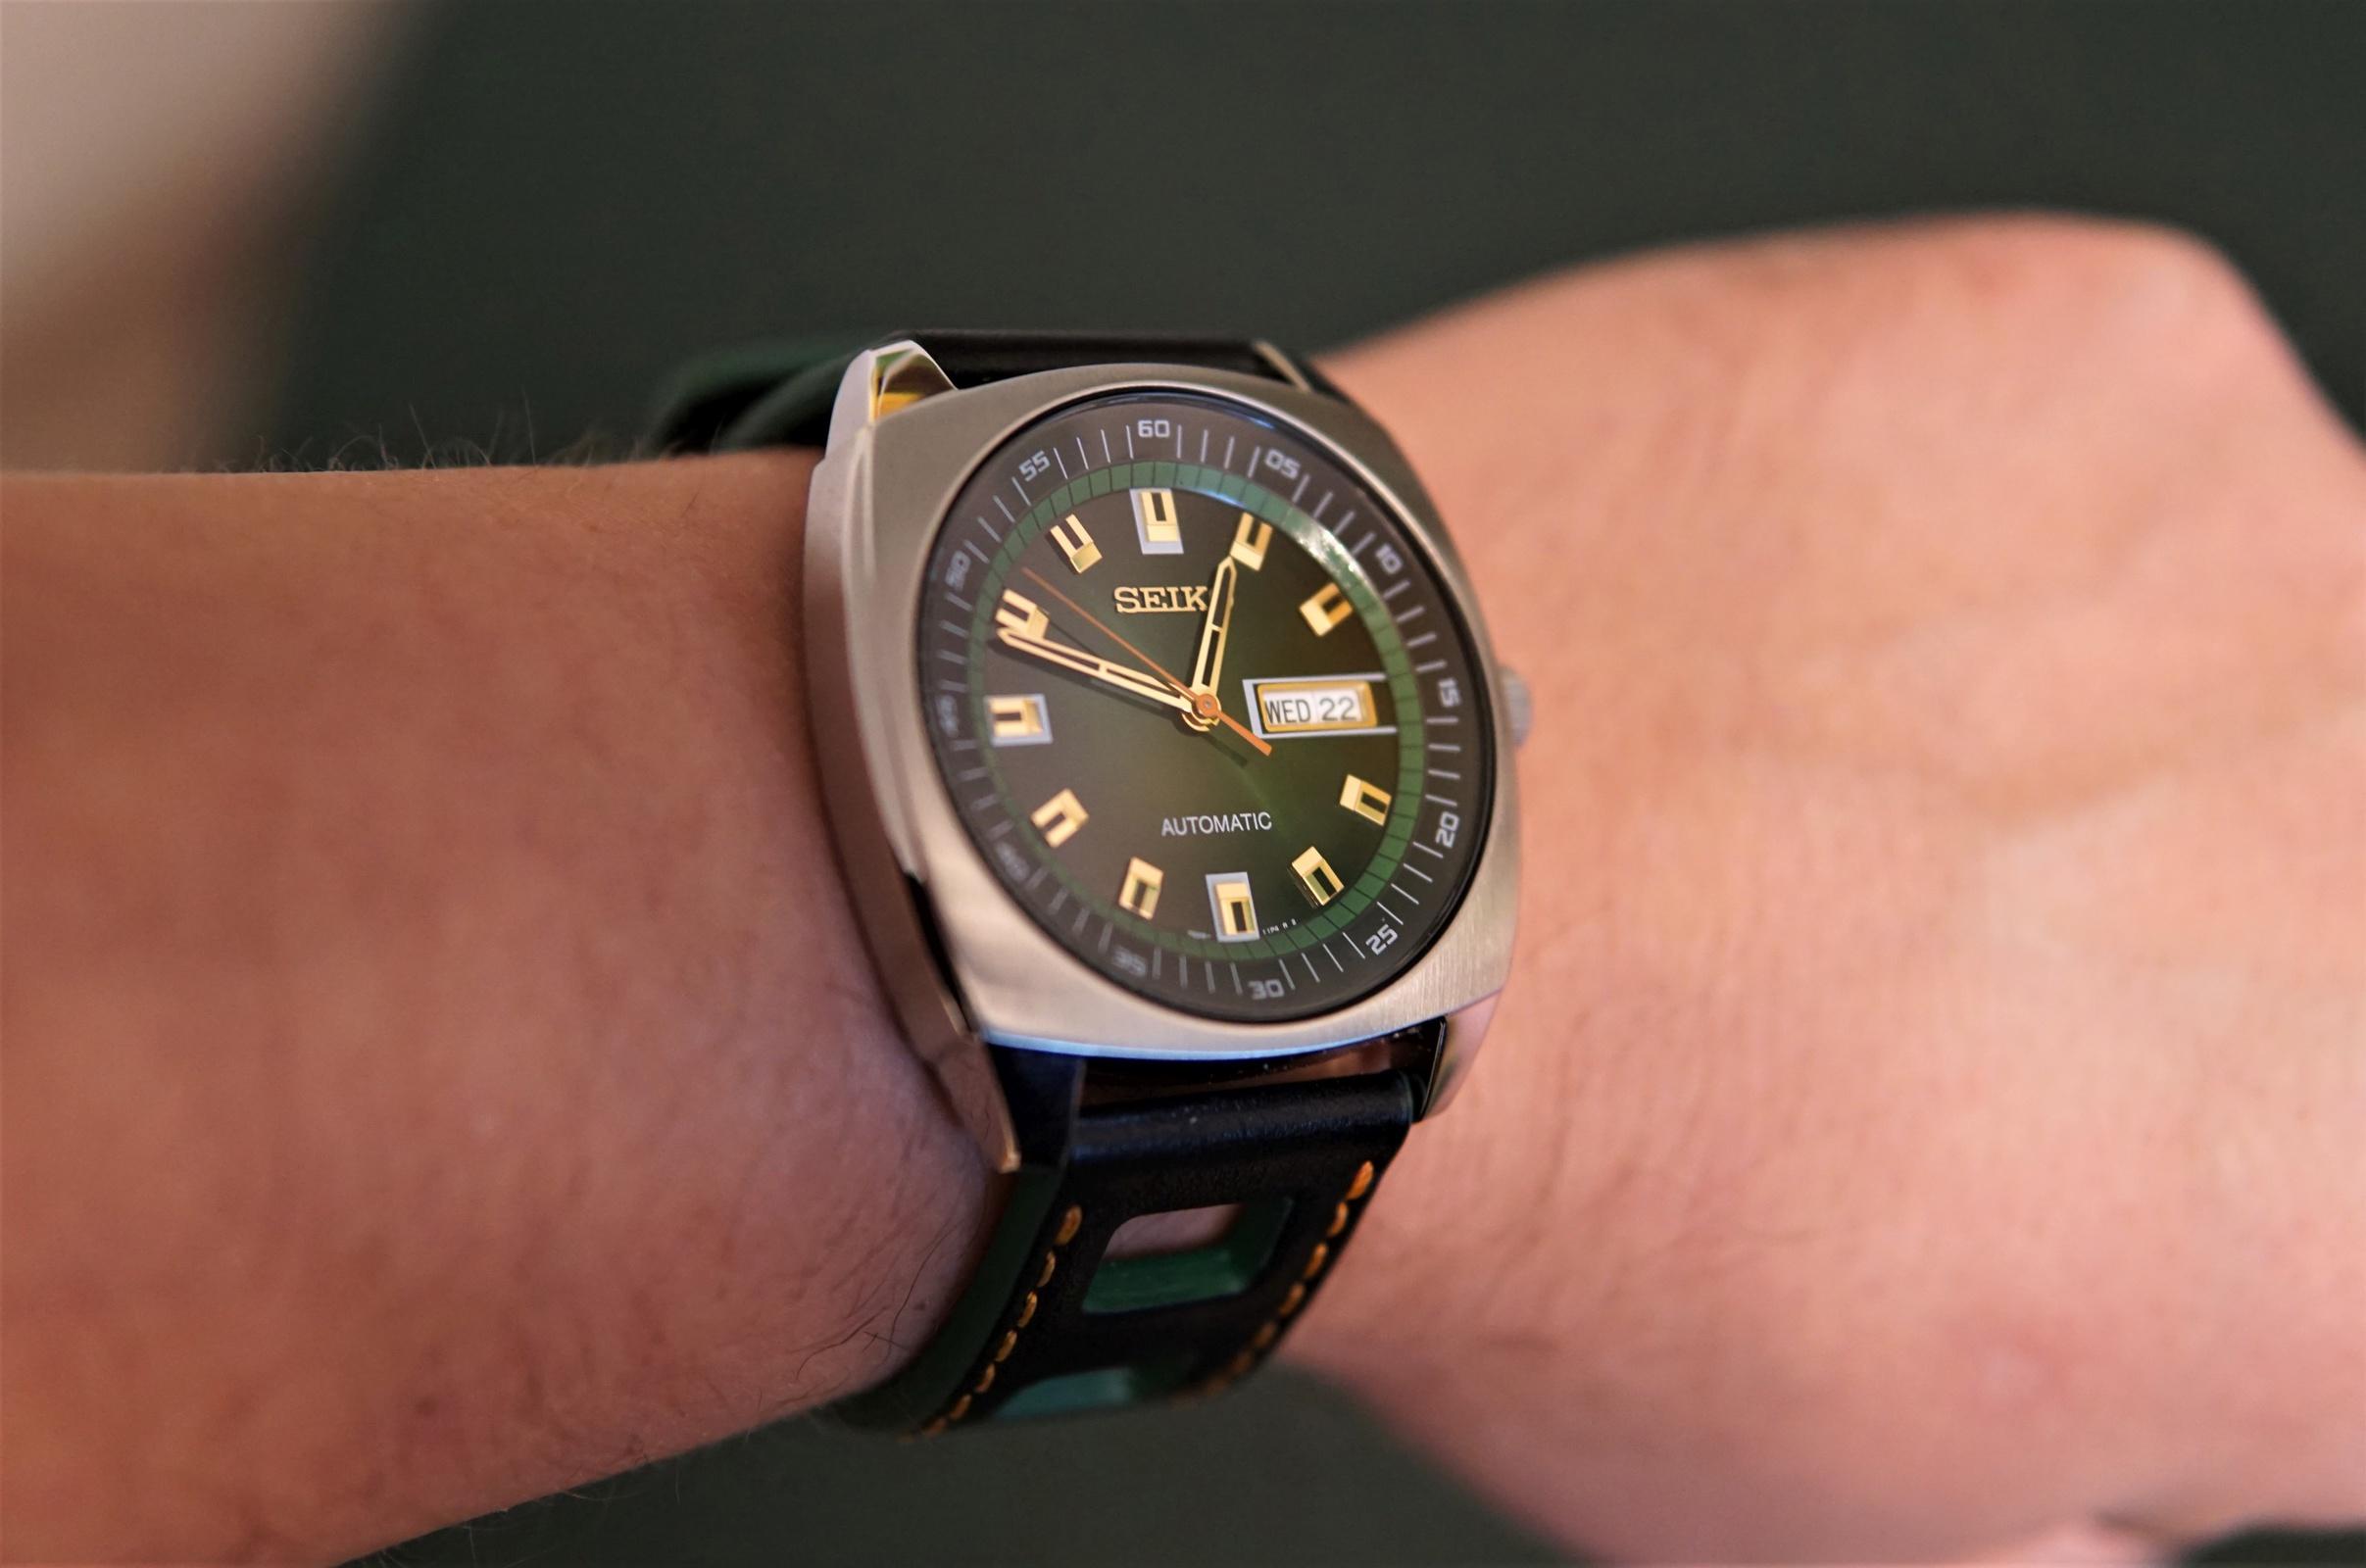 On the wrist photo